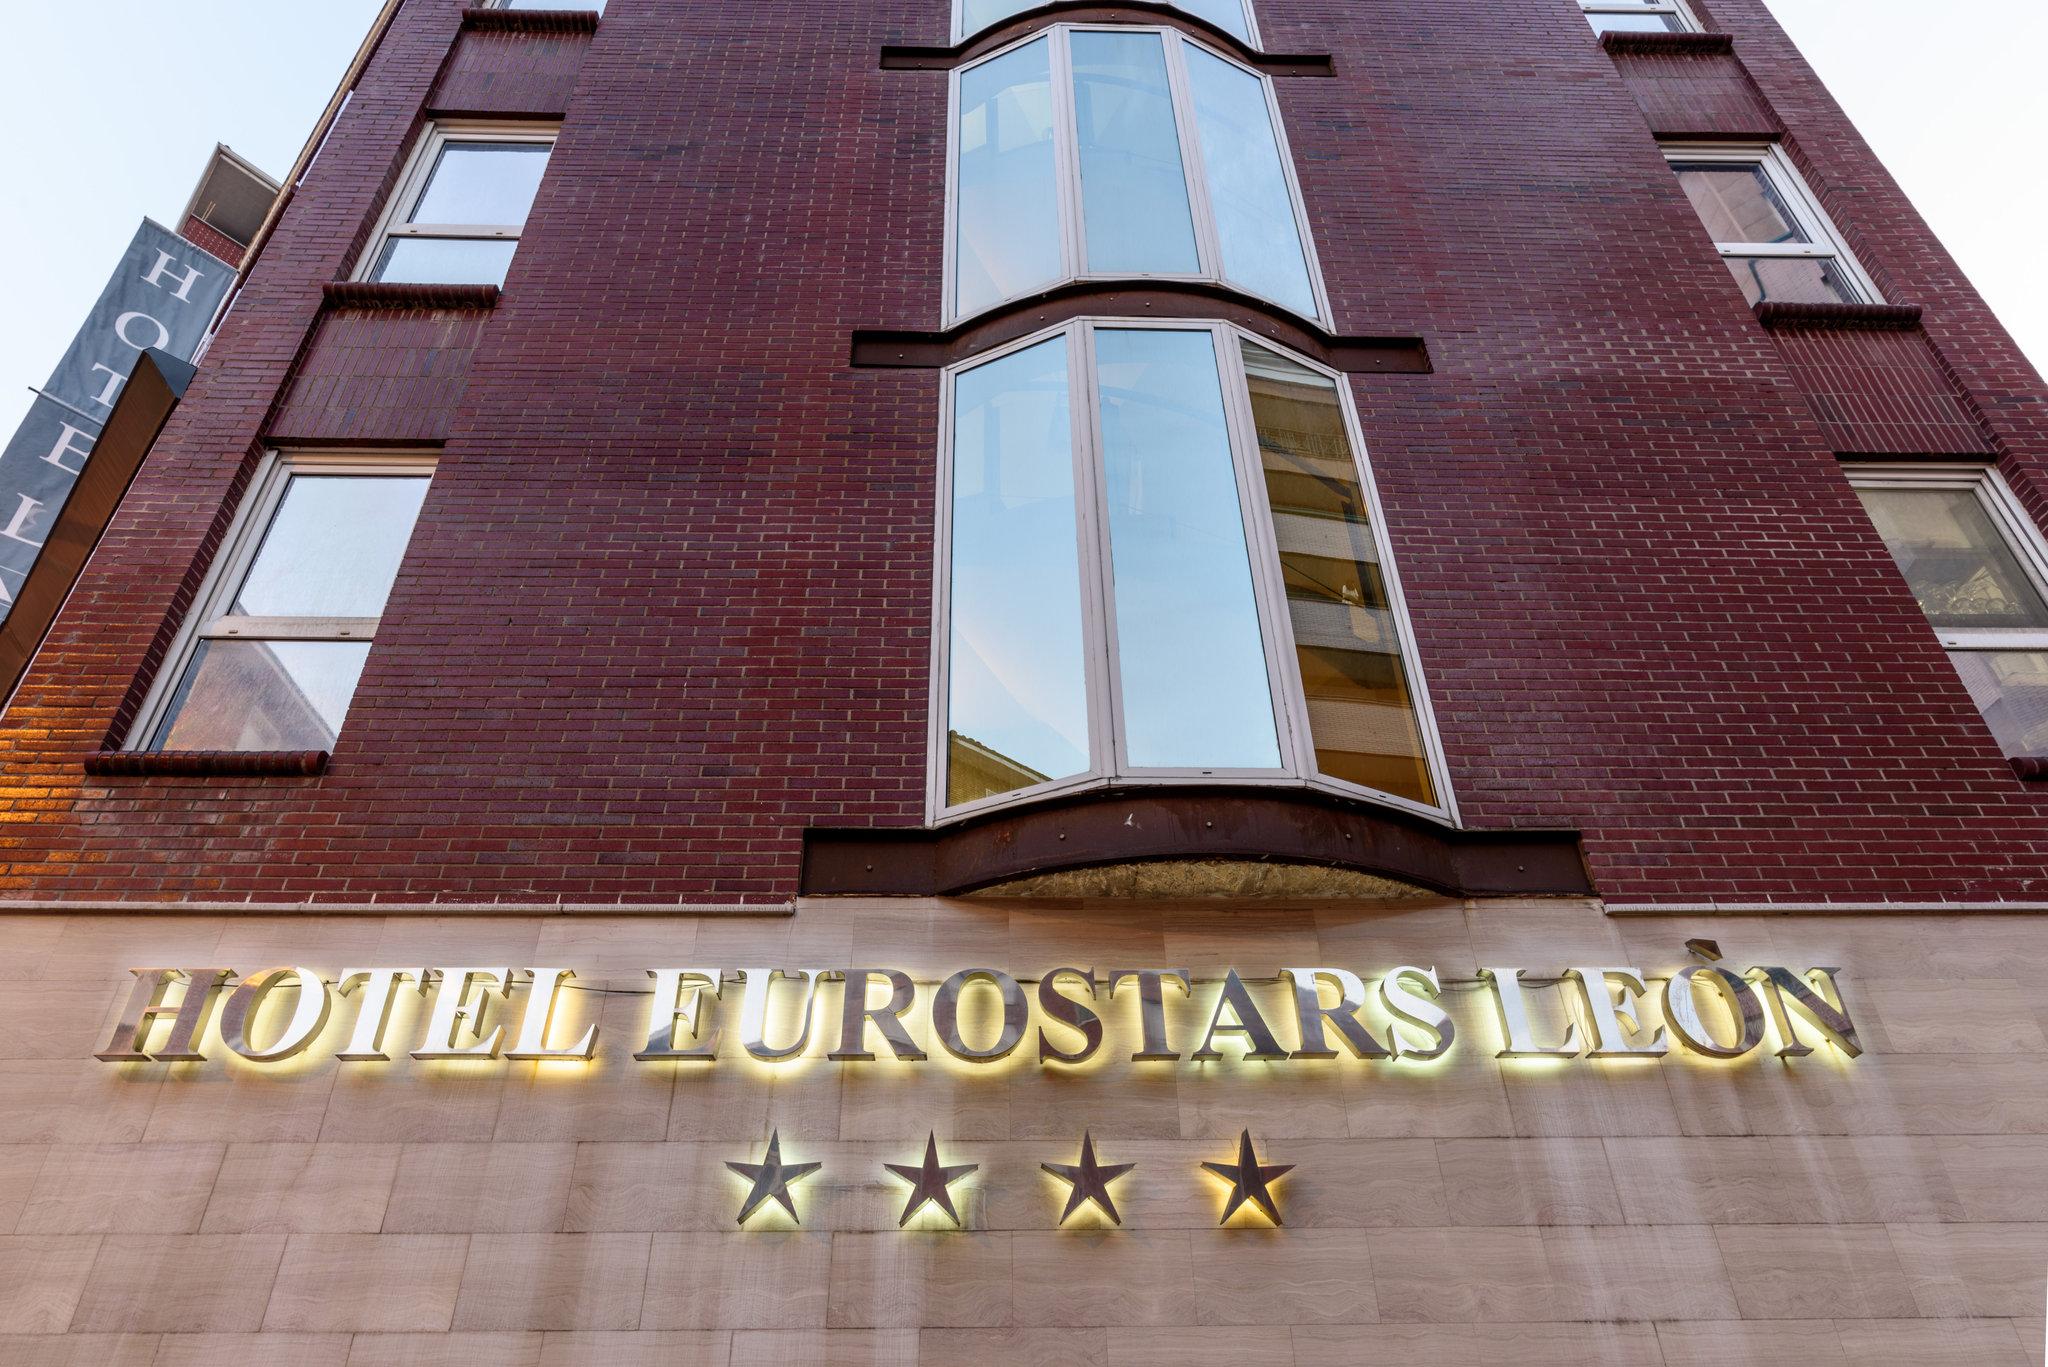 Eurostars Leon